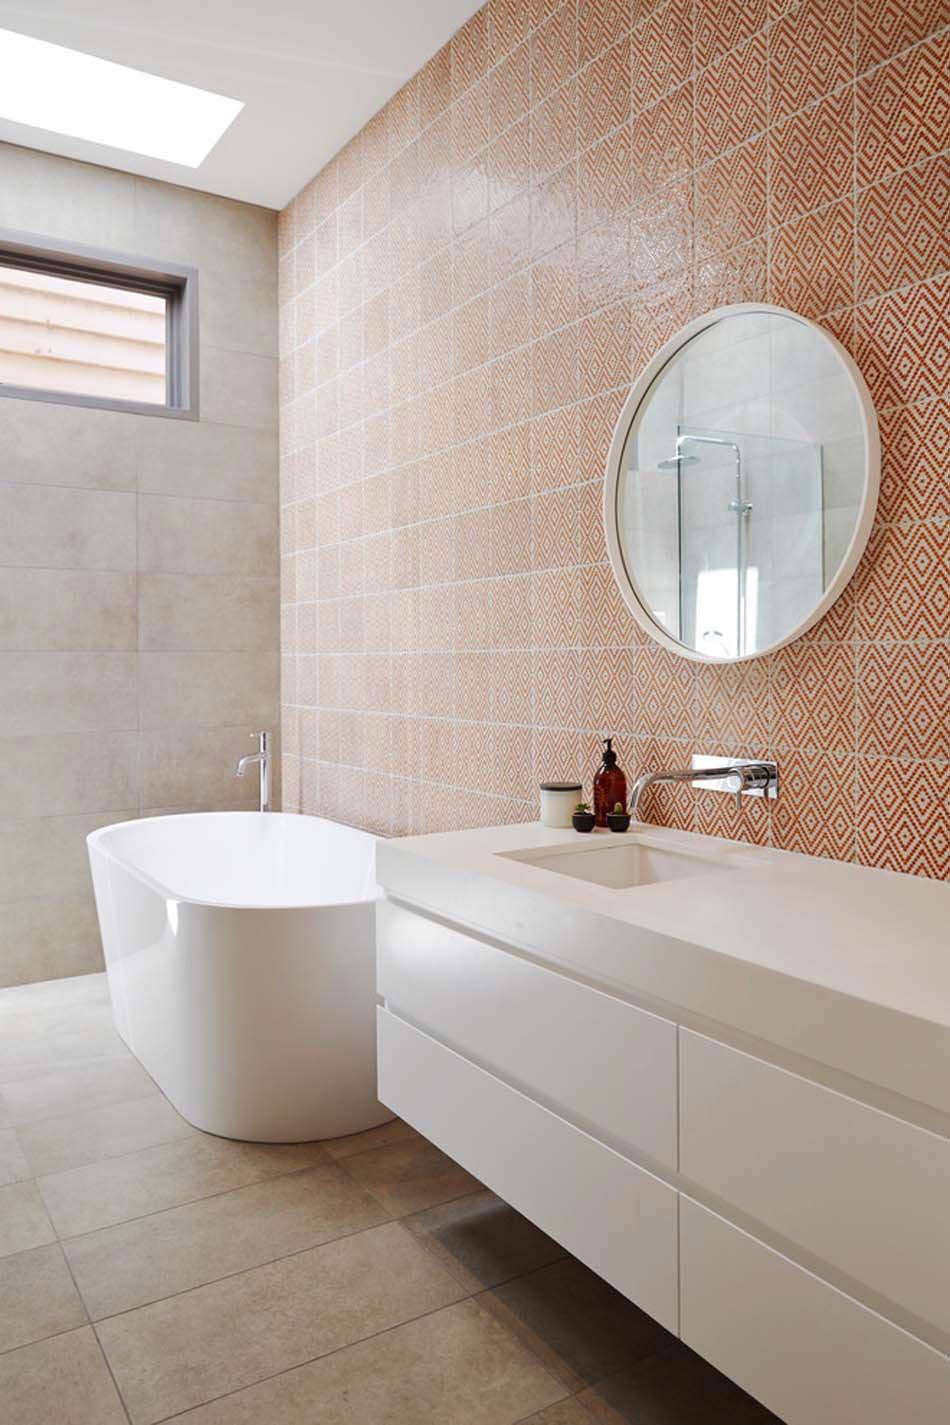 carrelage mural salle de bain design carrelage mural salle de bain design salle de douche. Black Bedroom Furniture Sets. Home Design Ideas